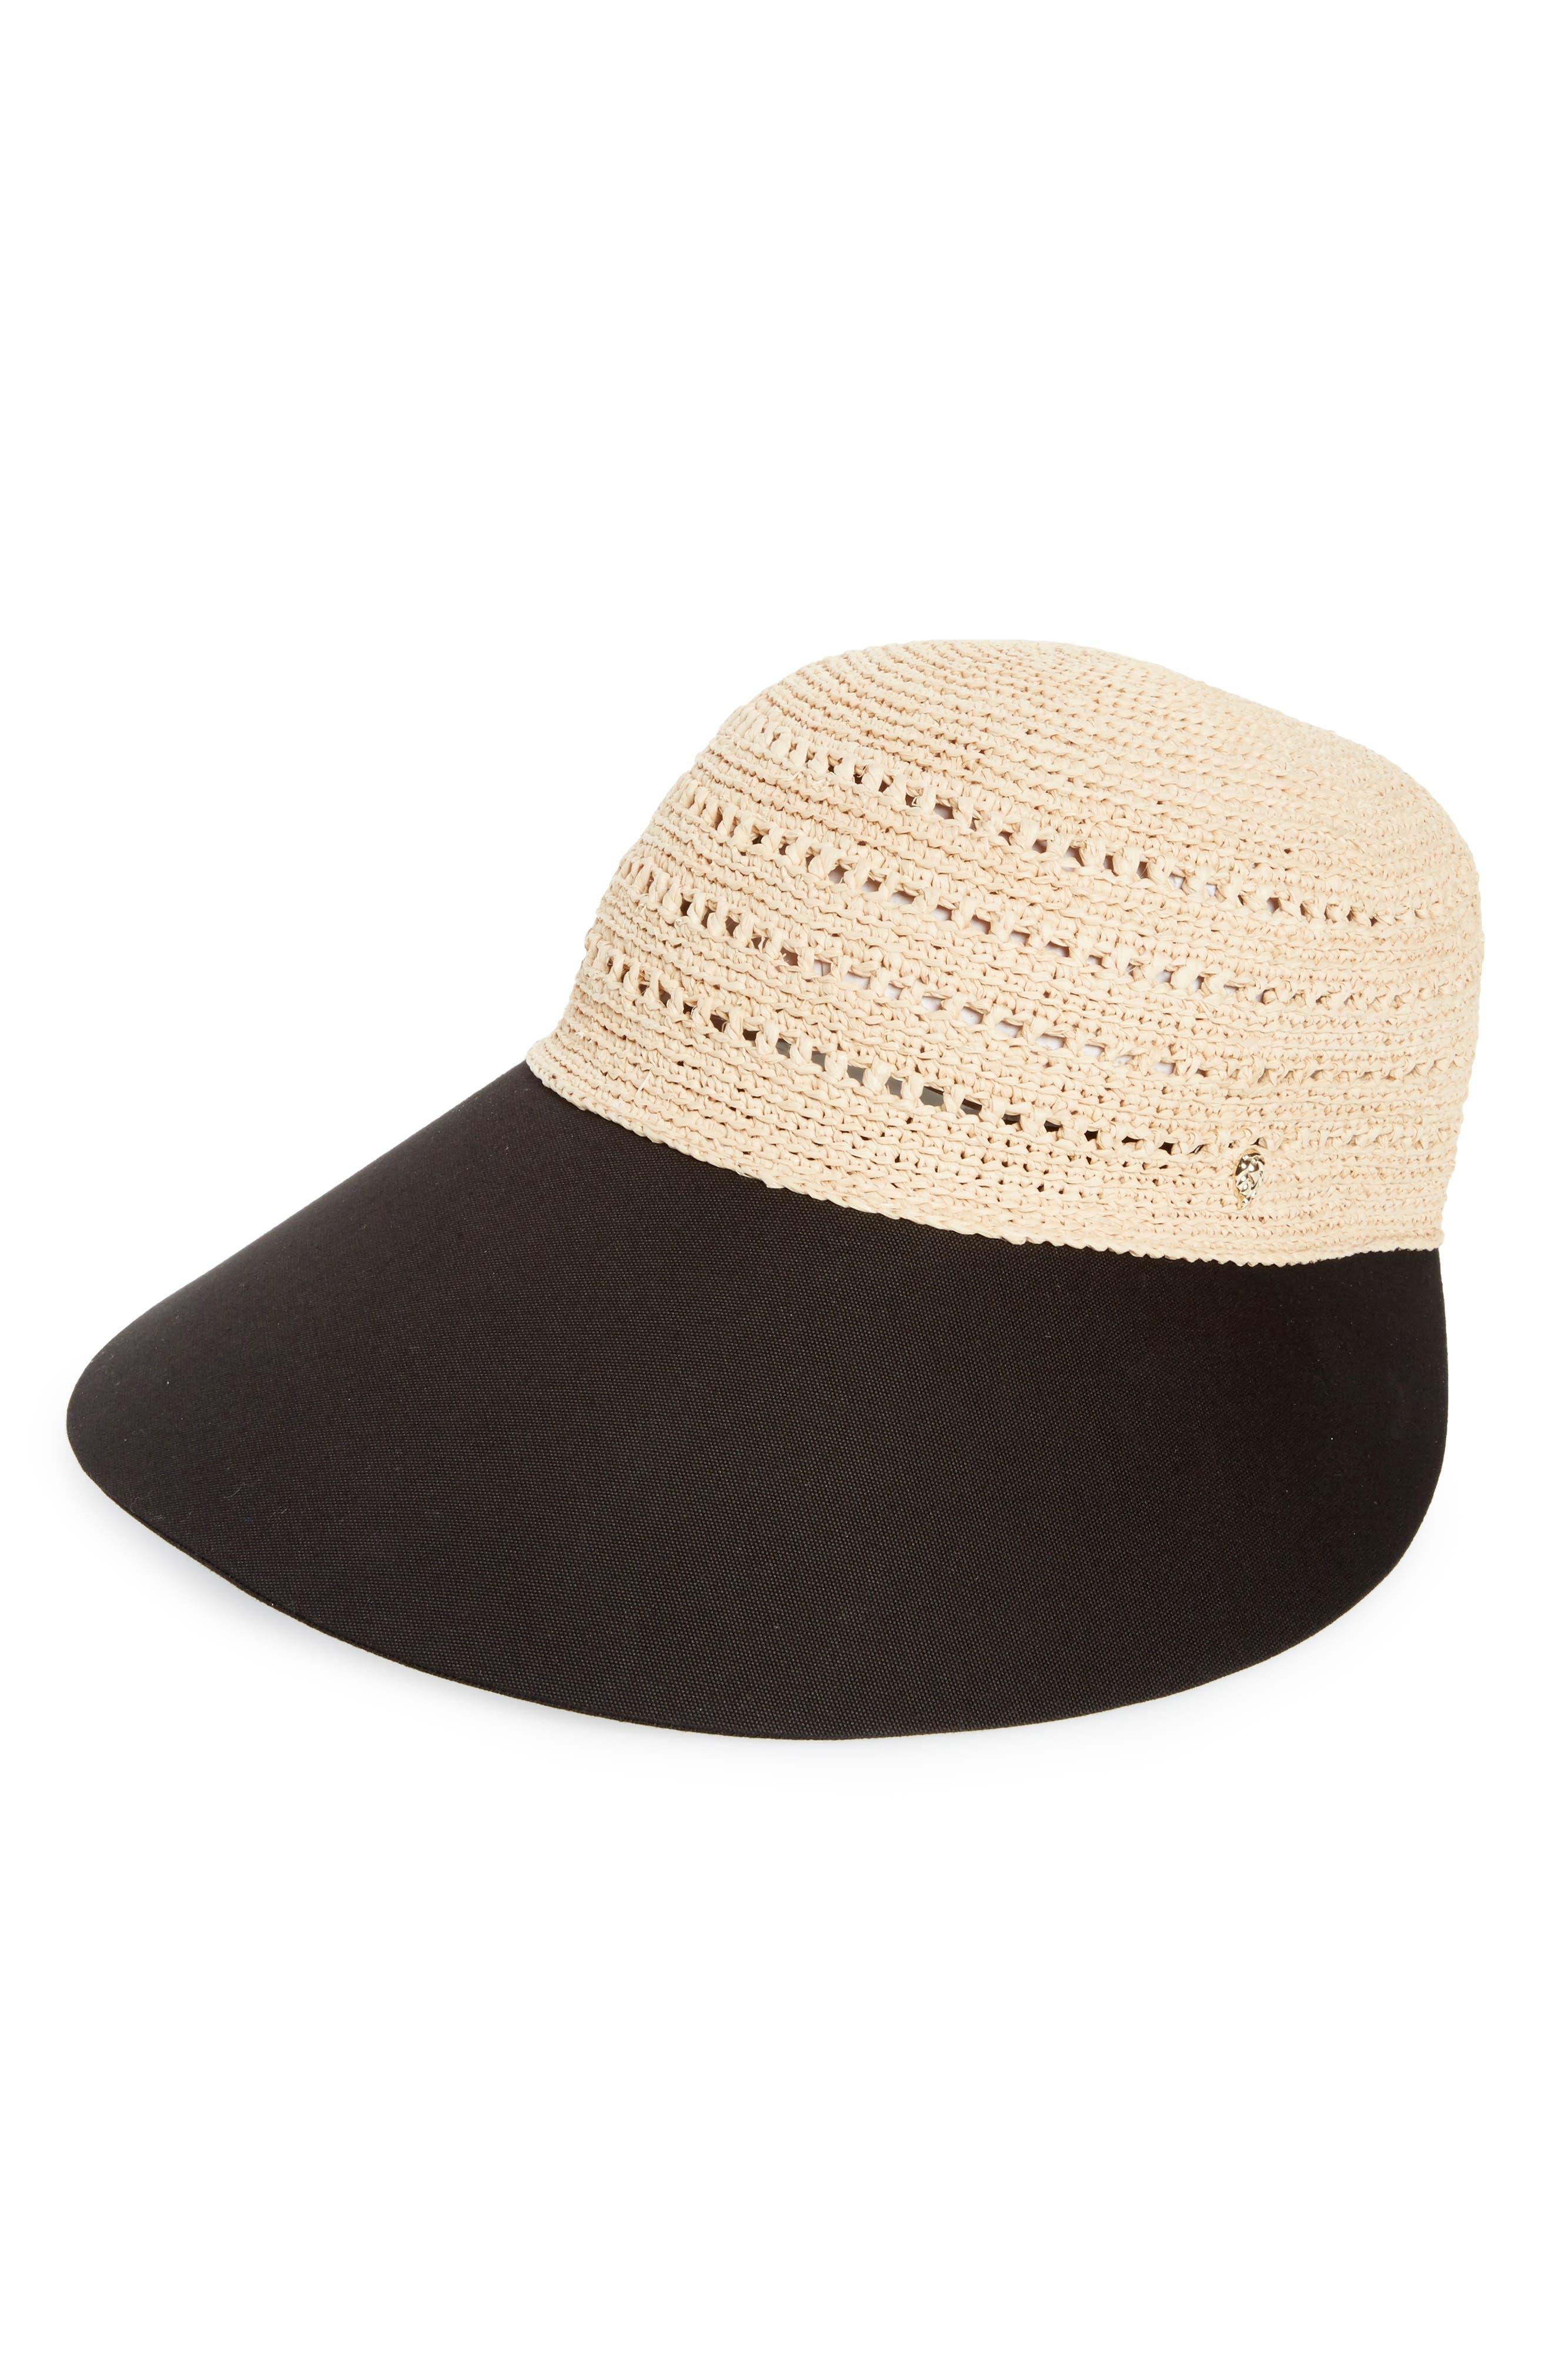 Alternate Image 1 Selected - Helen Kaminski Raffia Hat